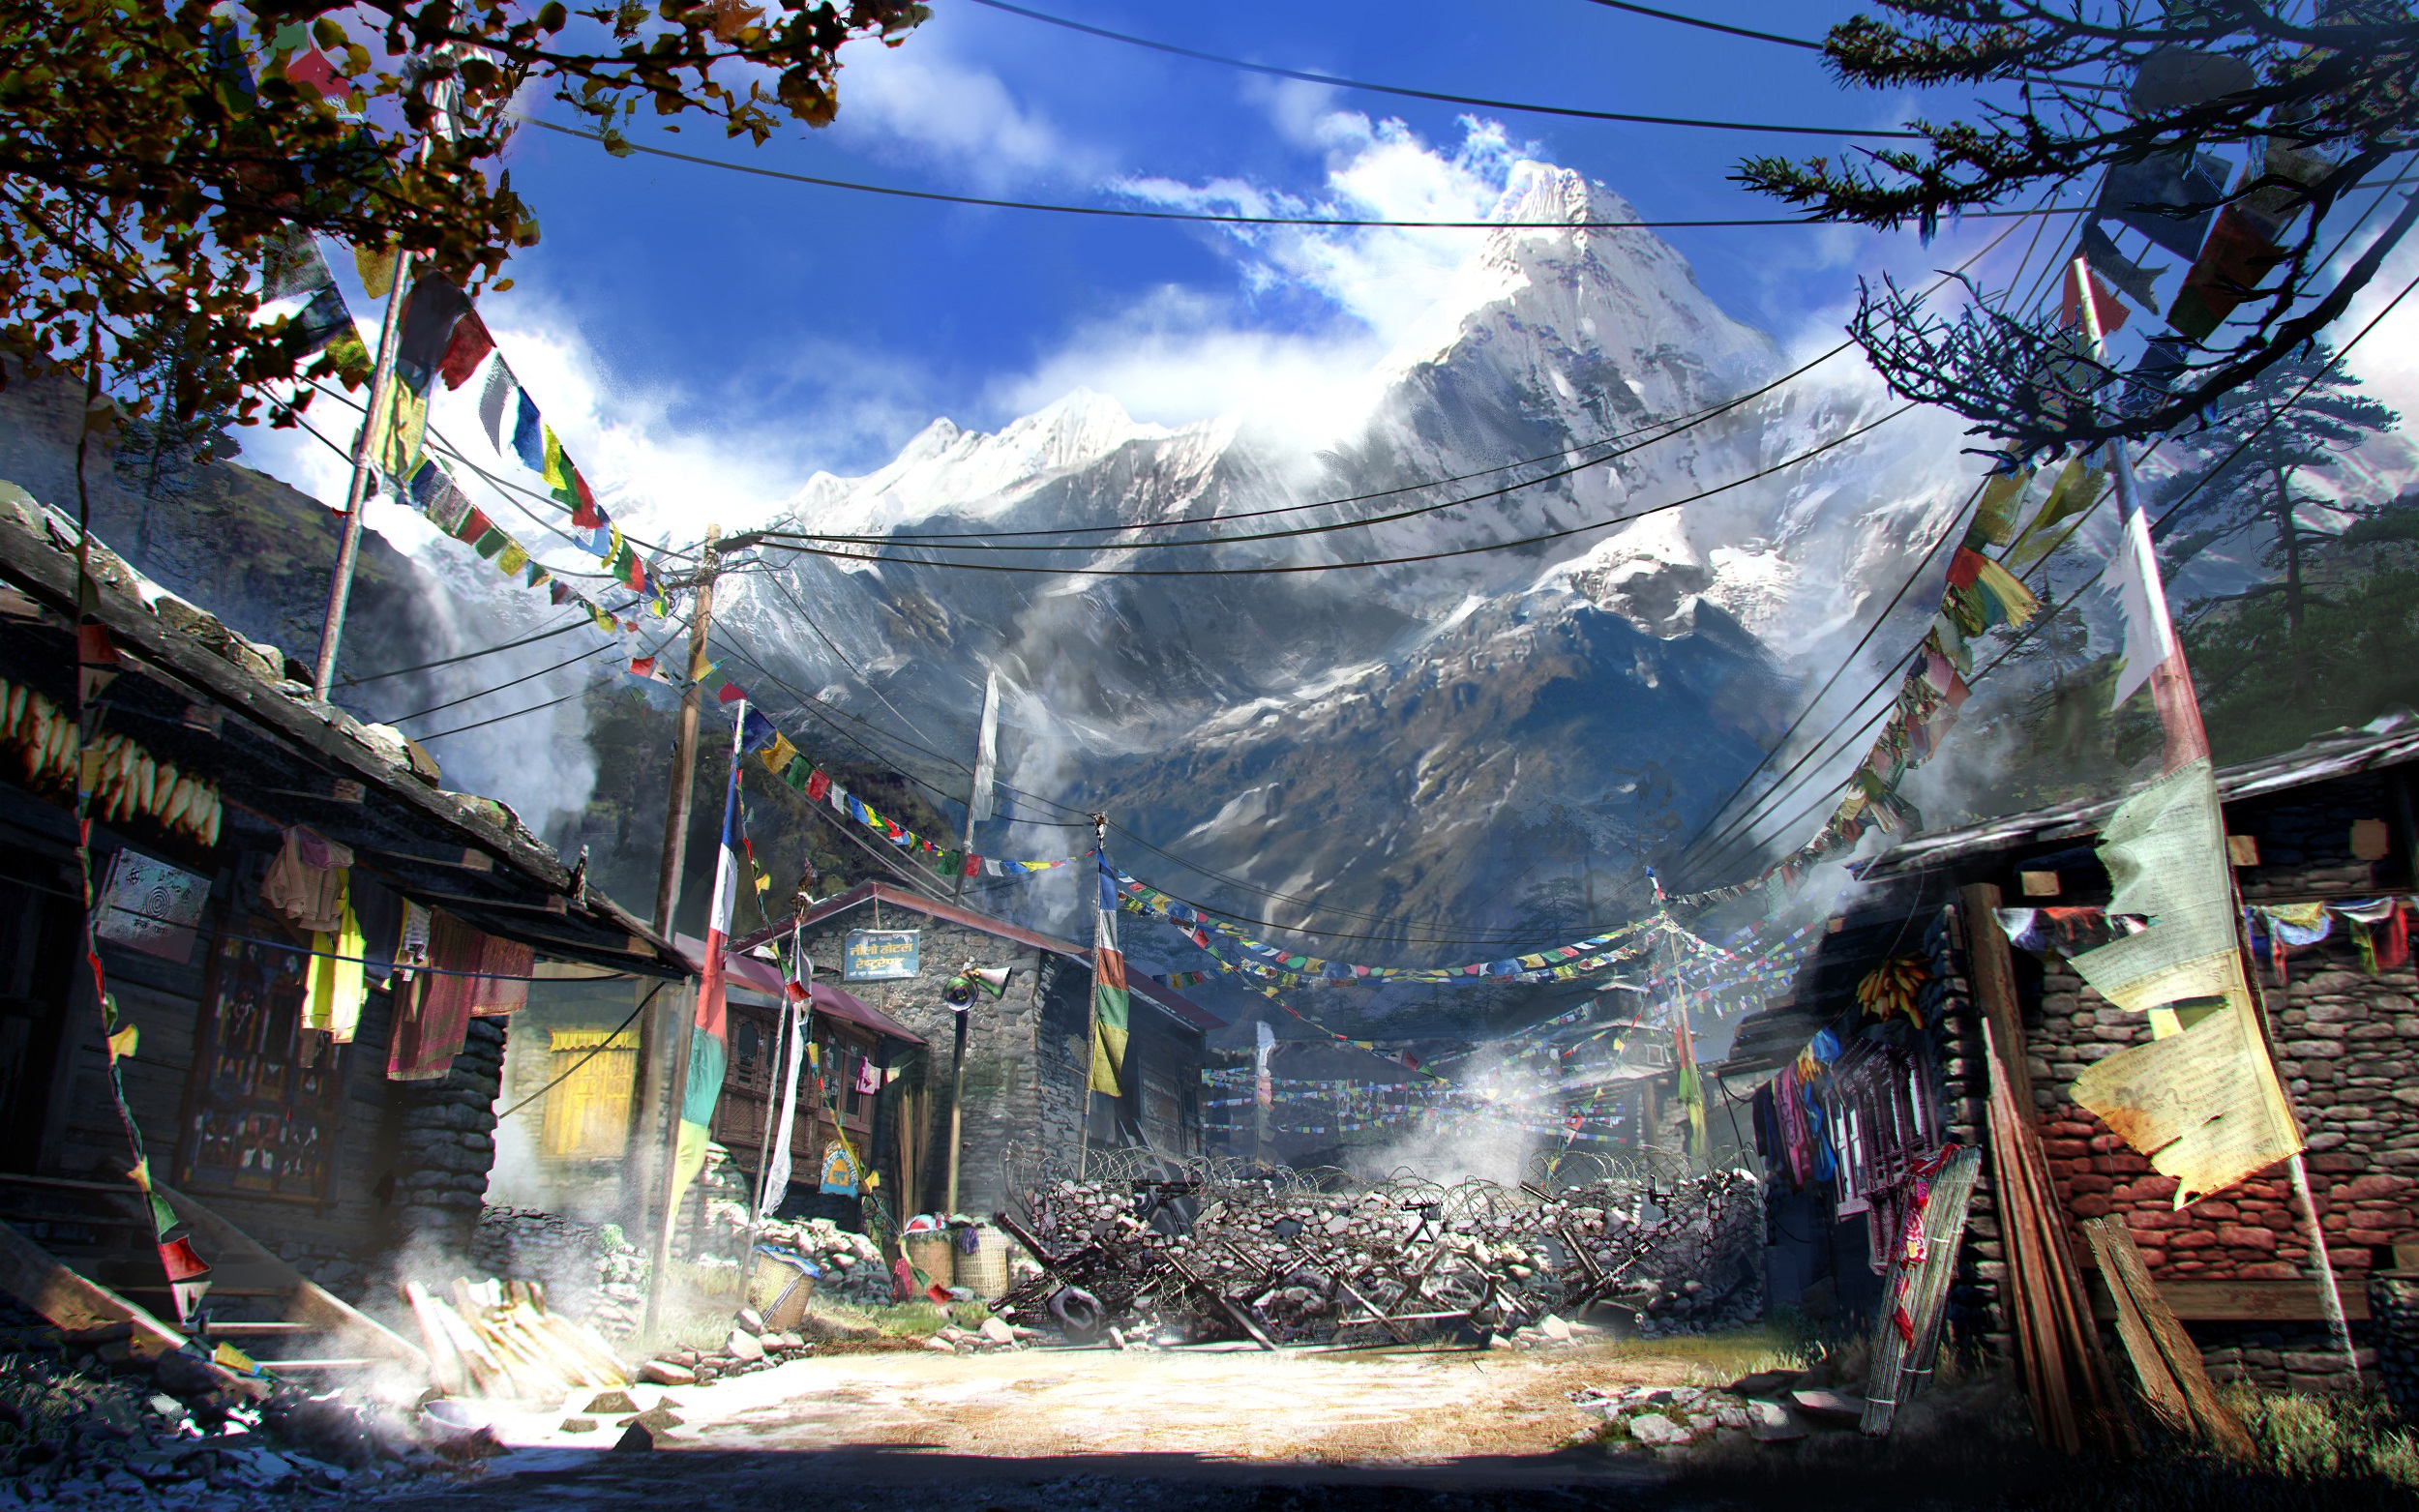 Free Download Fonds Dcran Far Cry 4 Tous Les Wallpapers Far Cry 4